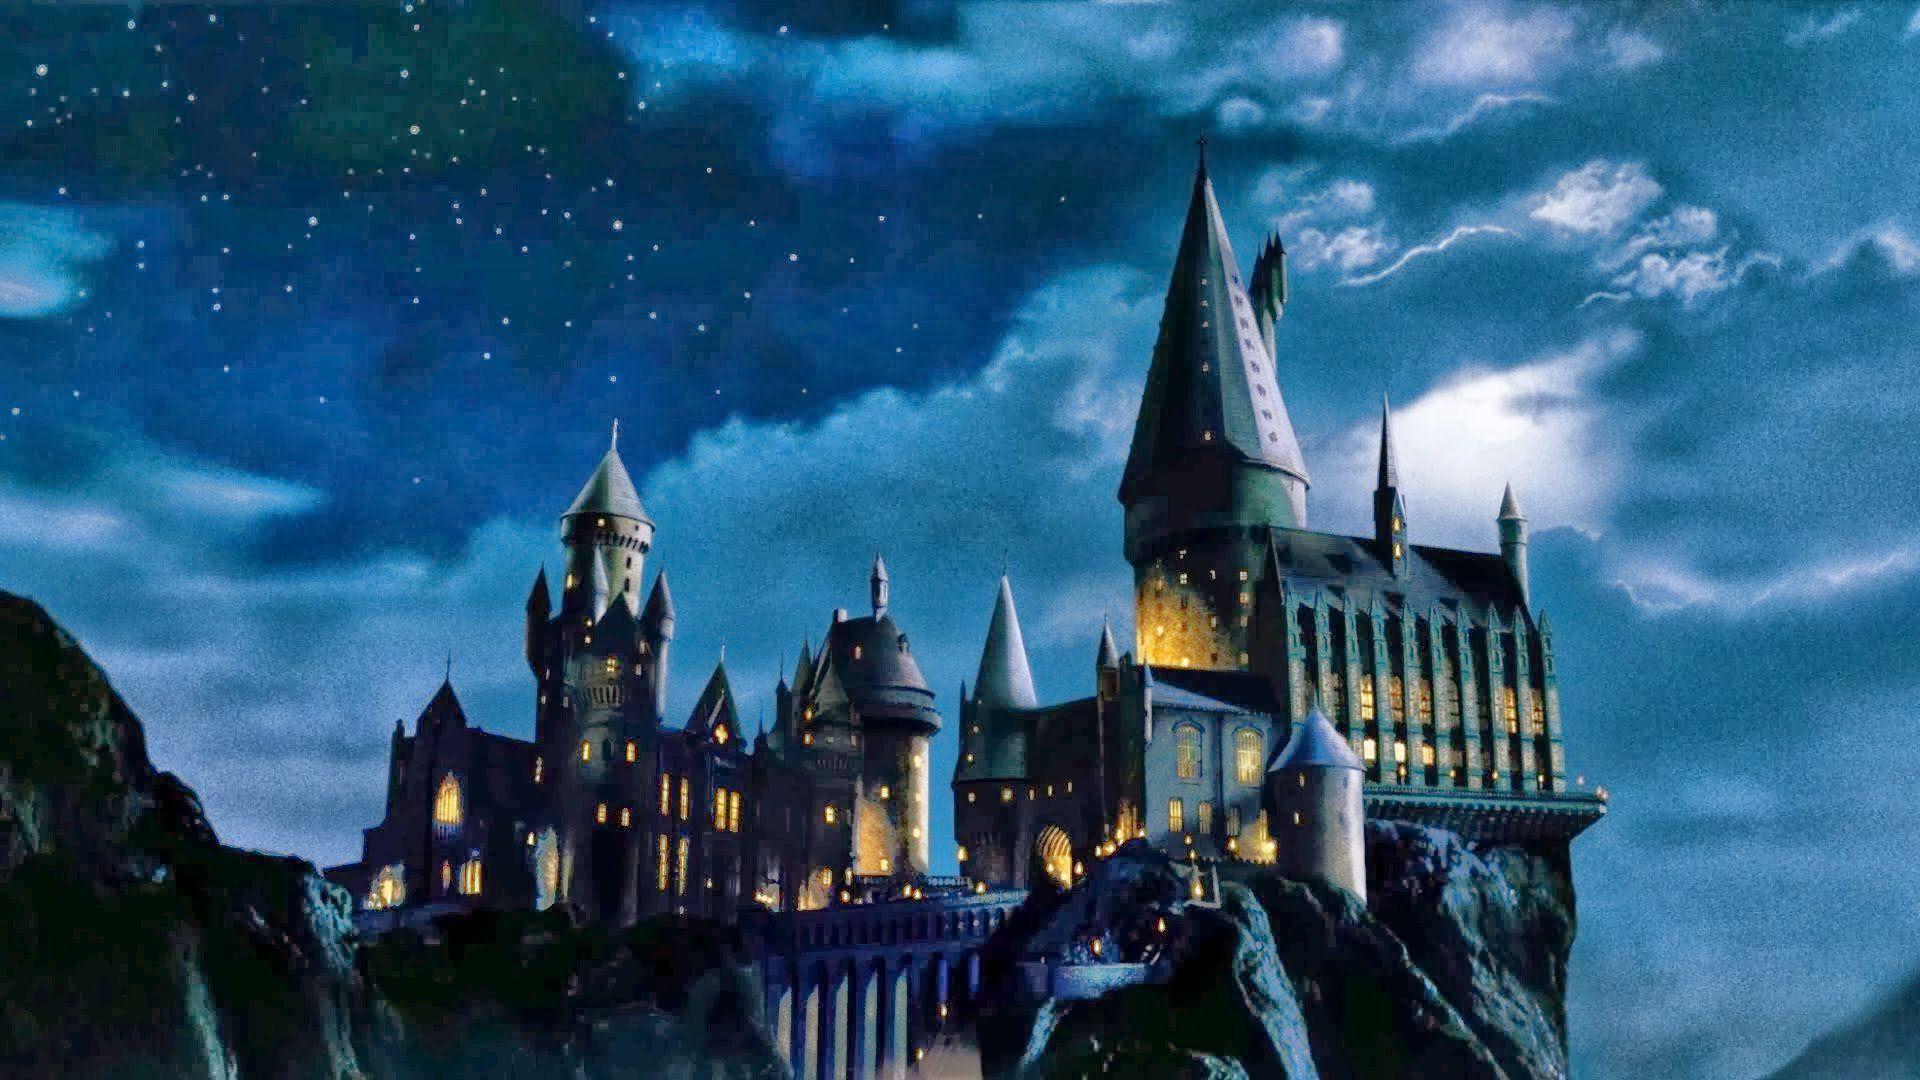 Hogwarts Castle Computer Wallpapers On Wallpaperdog